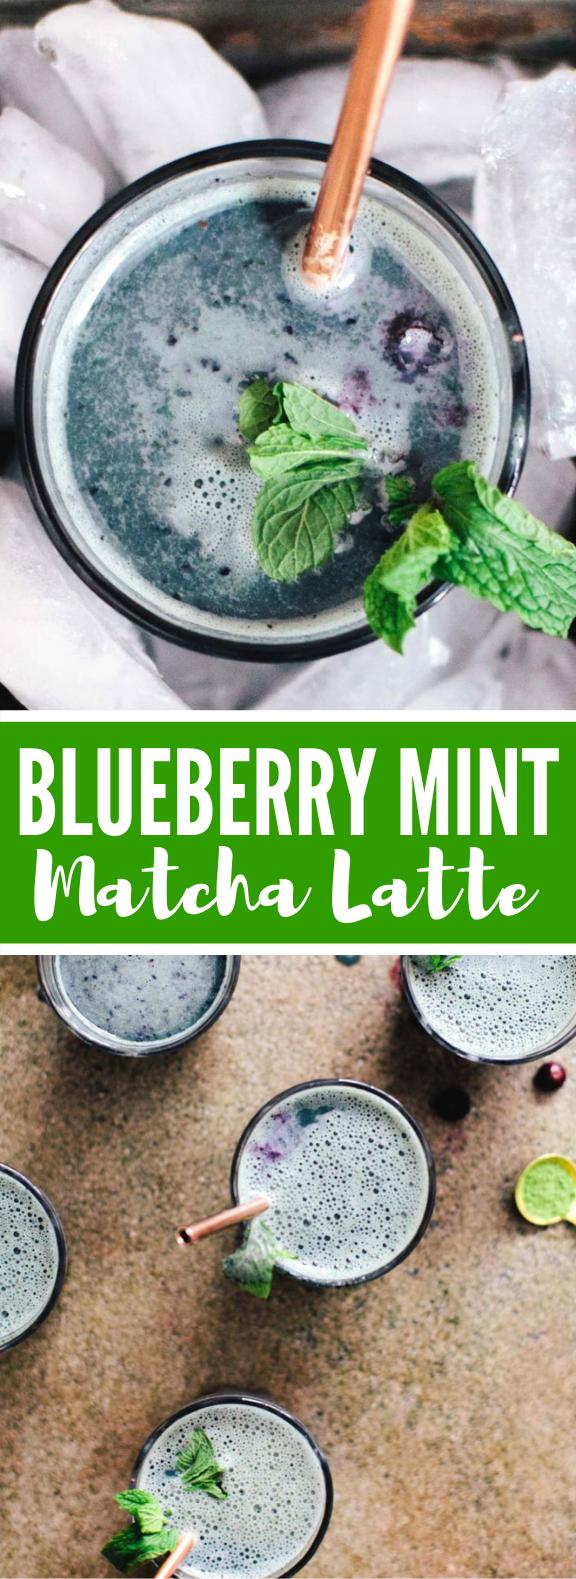 Blueberry Mint Matcha Latte #drinks #homemade